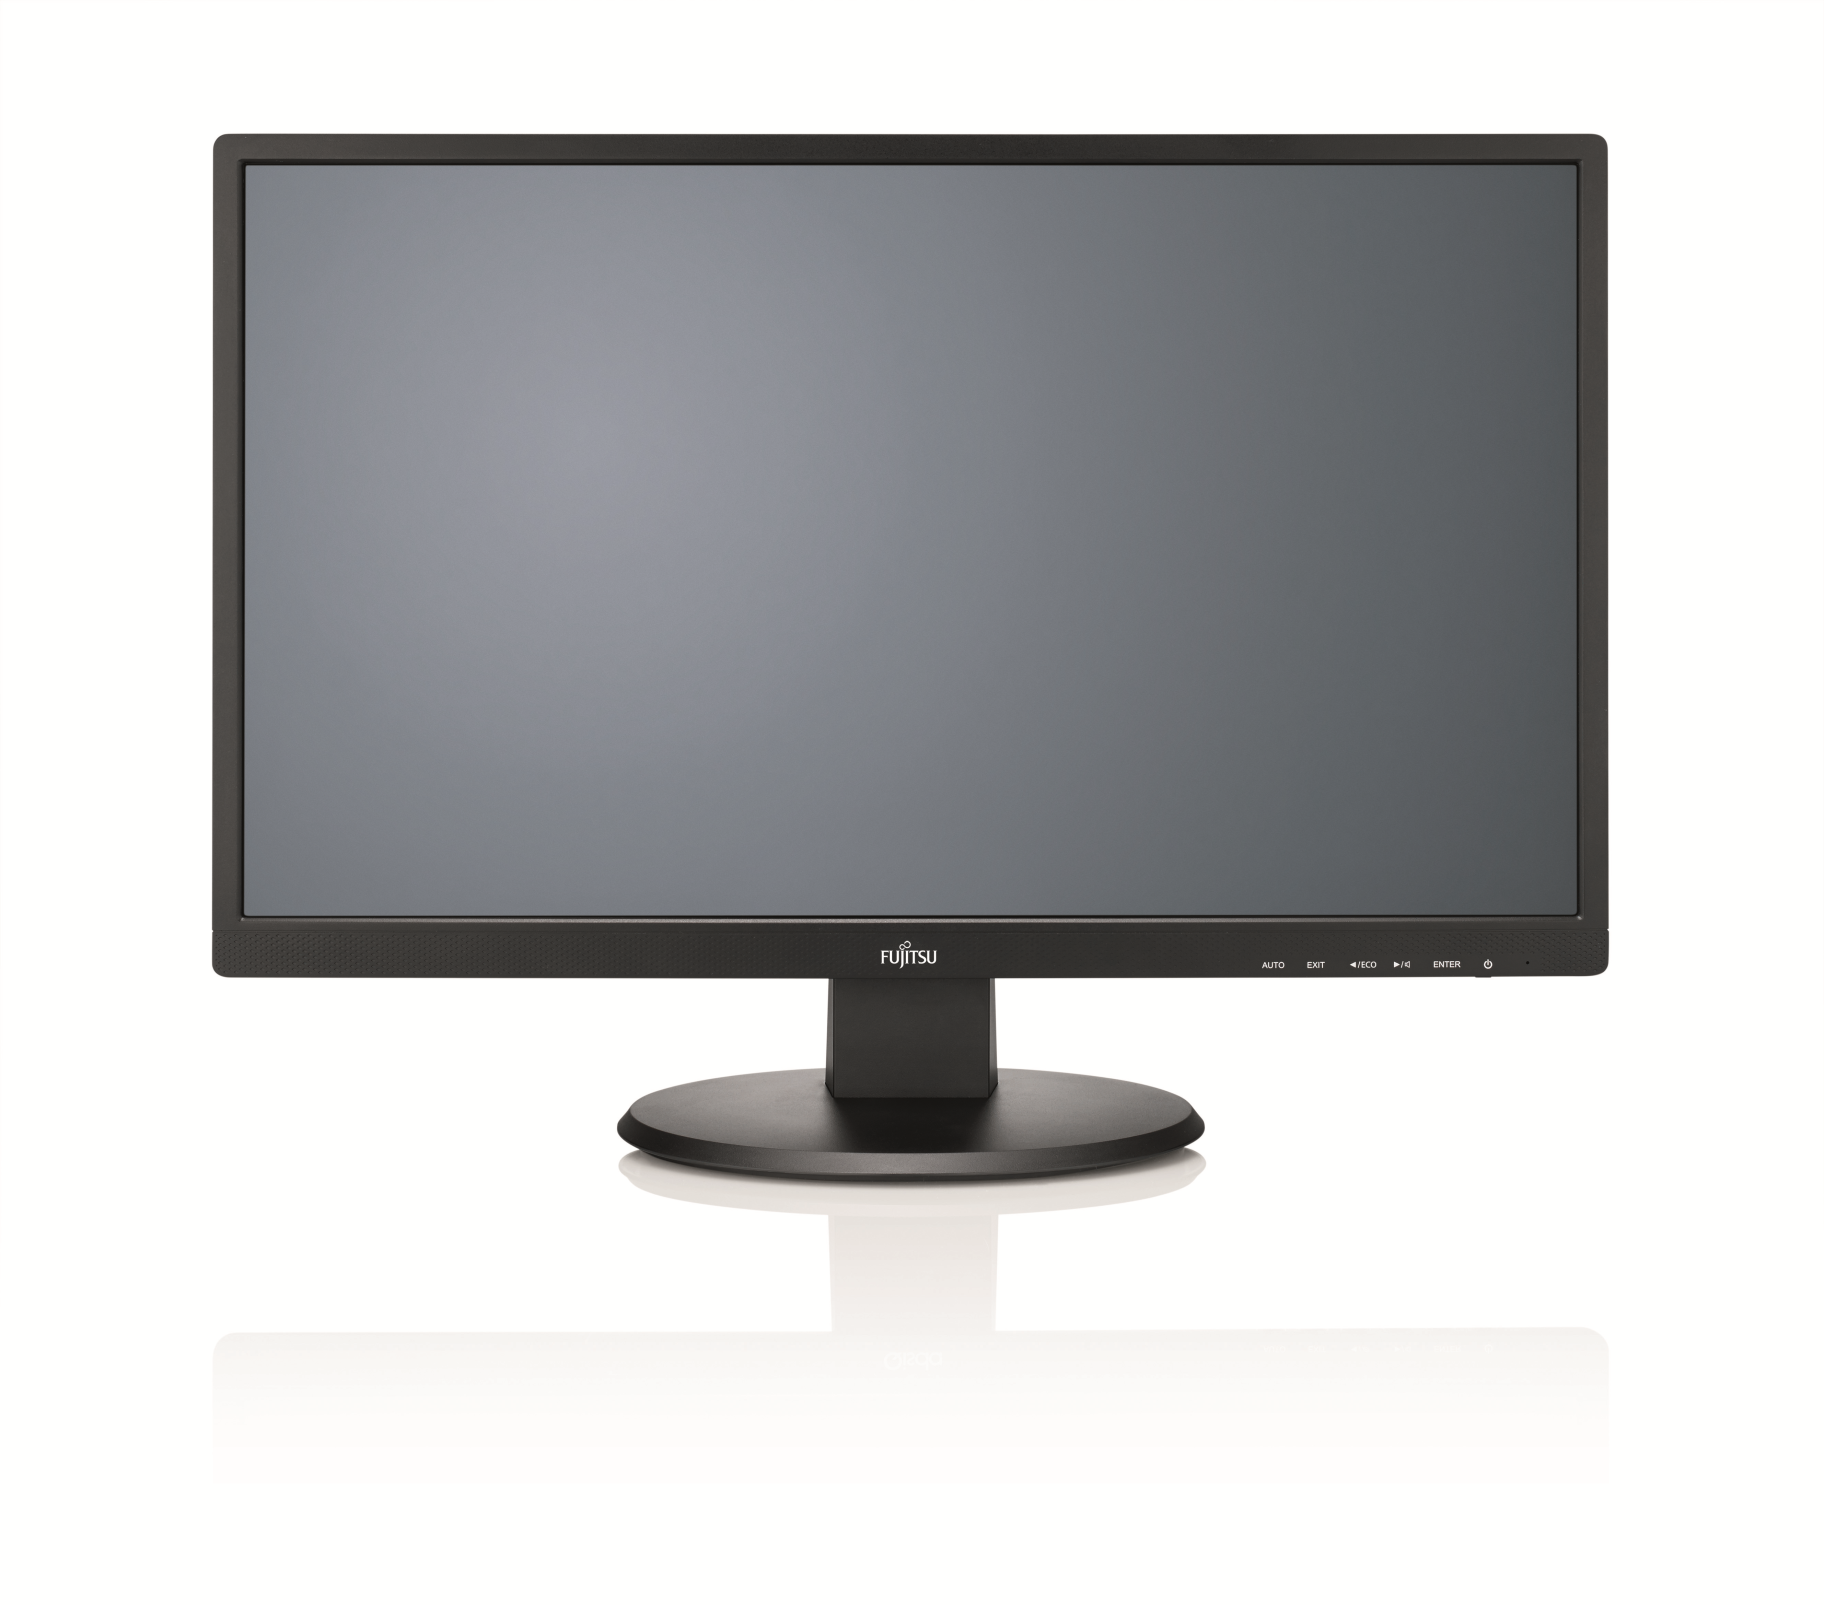 Fujitsu 24´´ E24T-8 PRO IPS 1920 x 1080/IPS/20M:1/5ms/250cd/VGA/DVI/DP/black